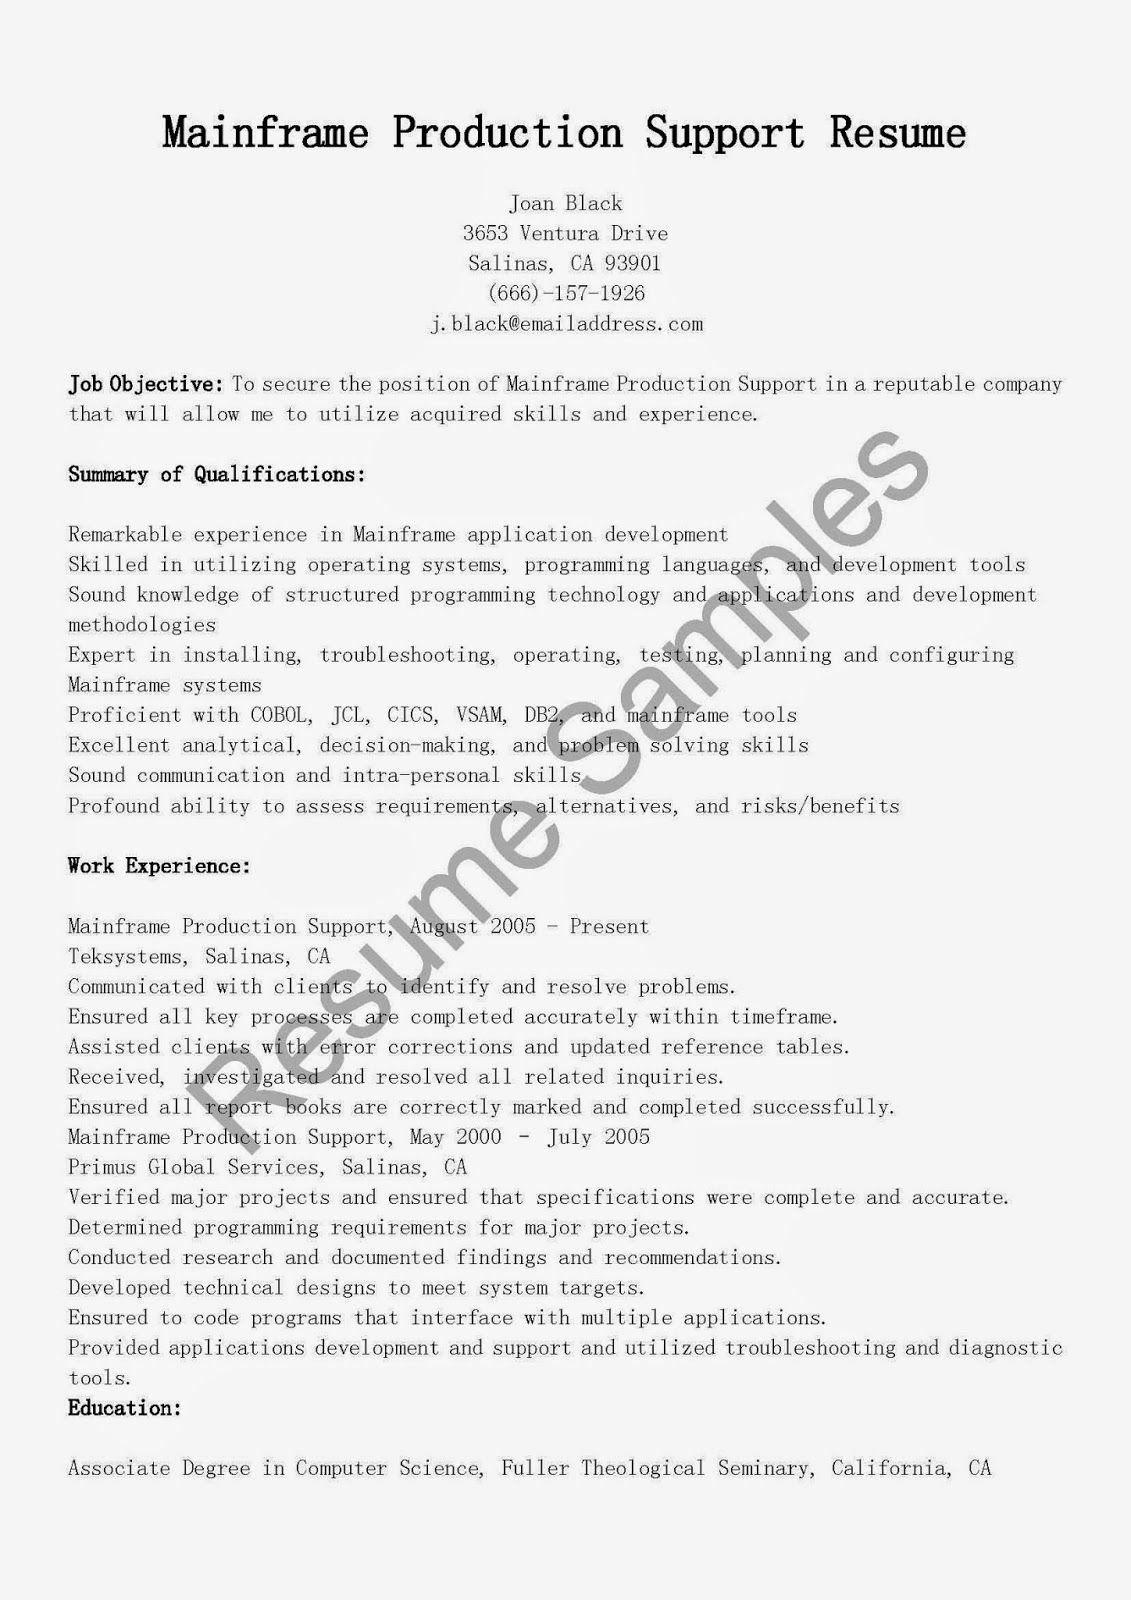 Java Production Support Resume Elegant Production Support Resume Sample Proposal Surat Tulisan